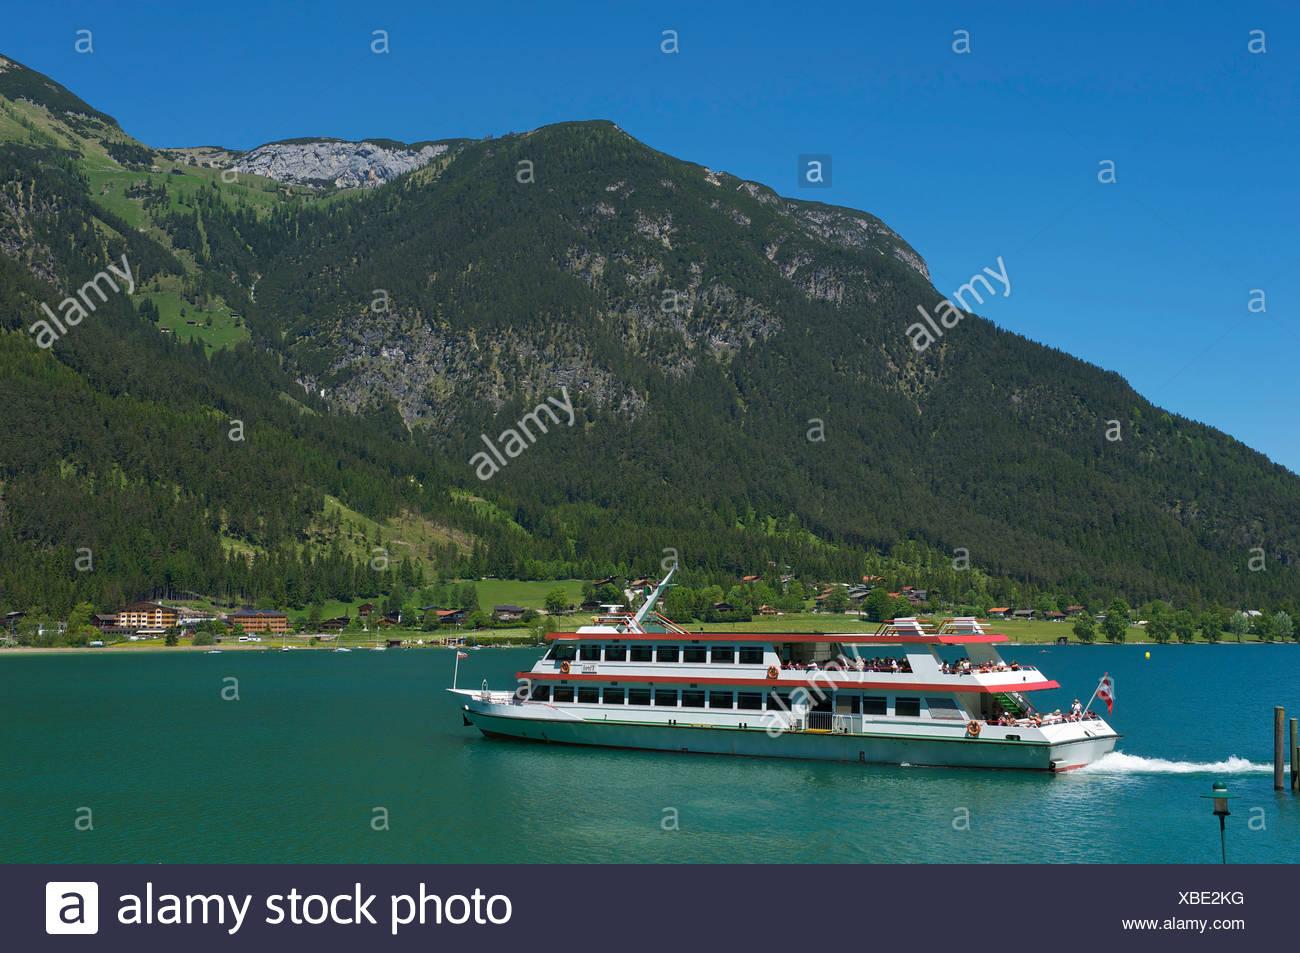 Achensee-Schifffahrt ship on Lake Achensee, Tyrol, Austria, Europe - Stock Image